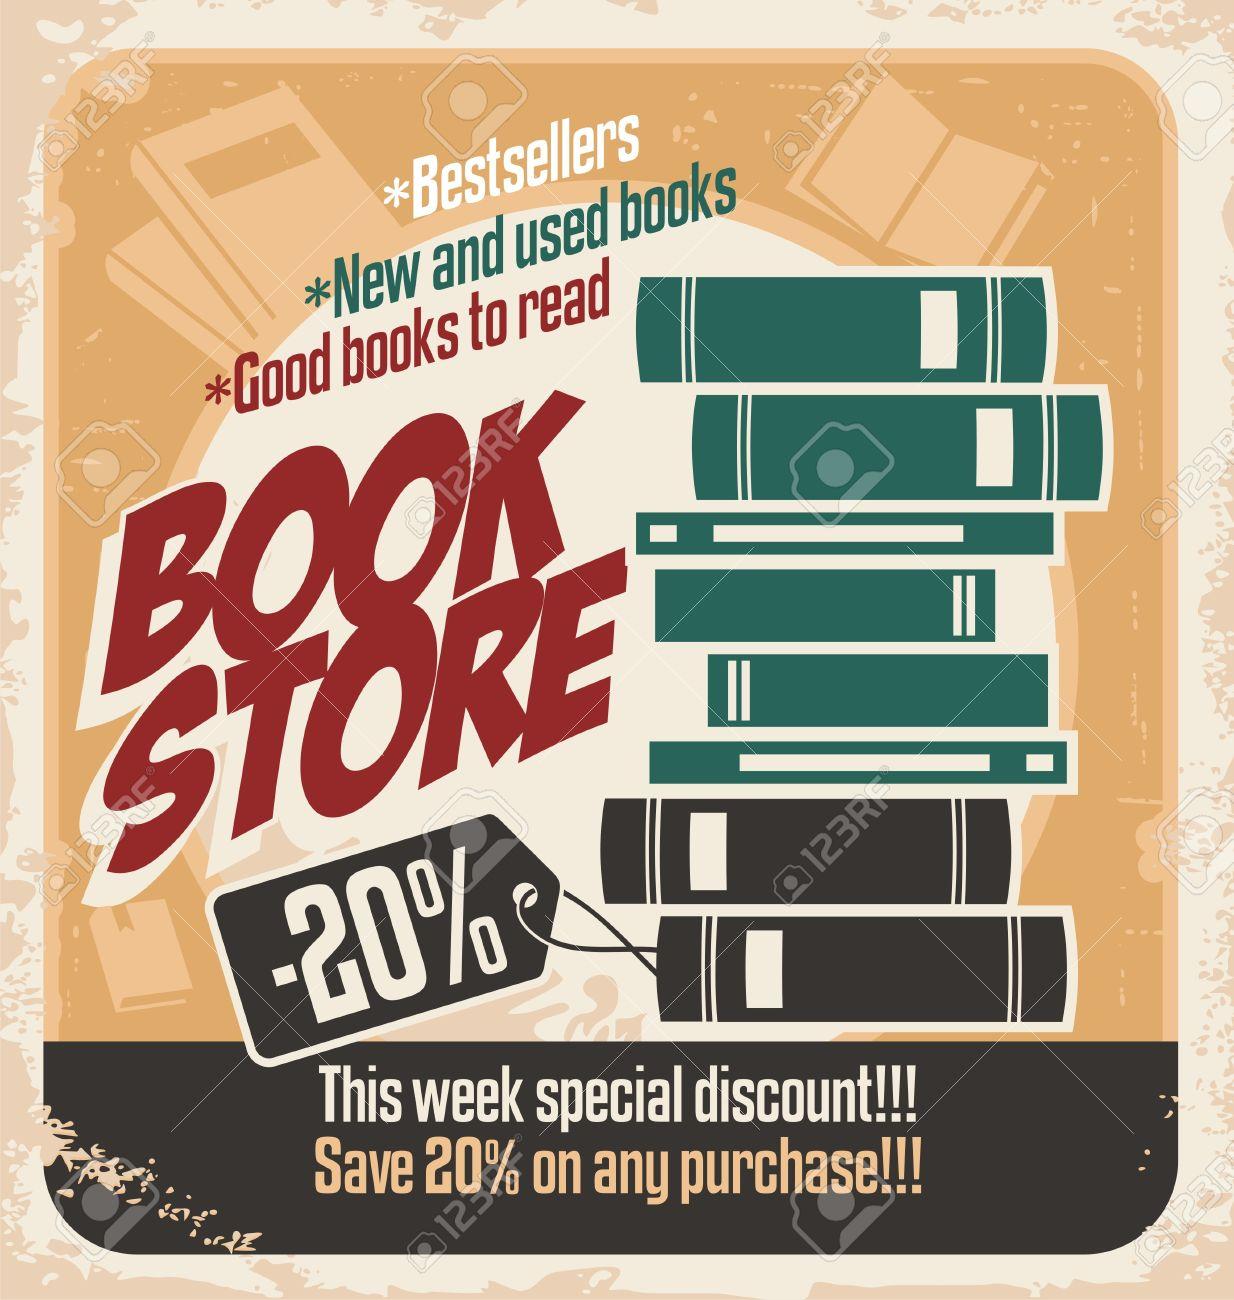 Design poster retro - Retro Bookstore Poster Design Vintage Poster Template With Books Stock Vector 17758259